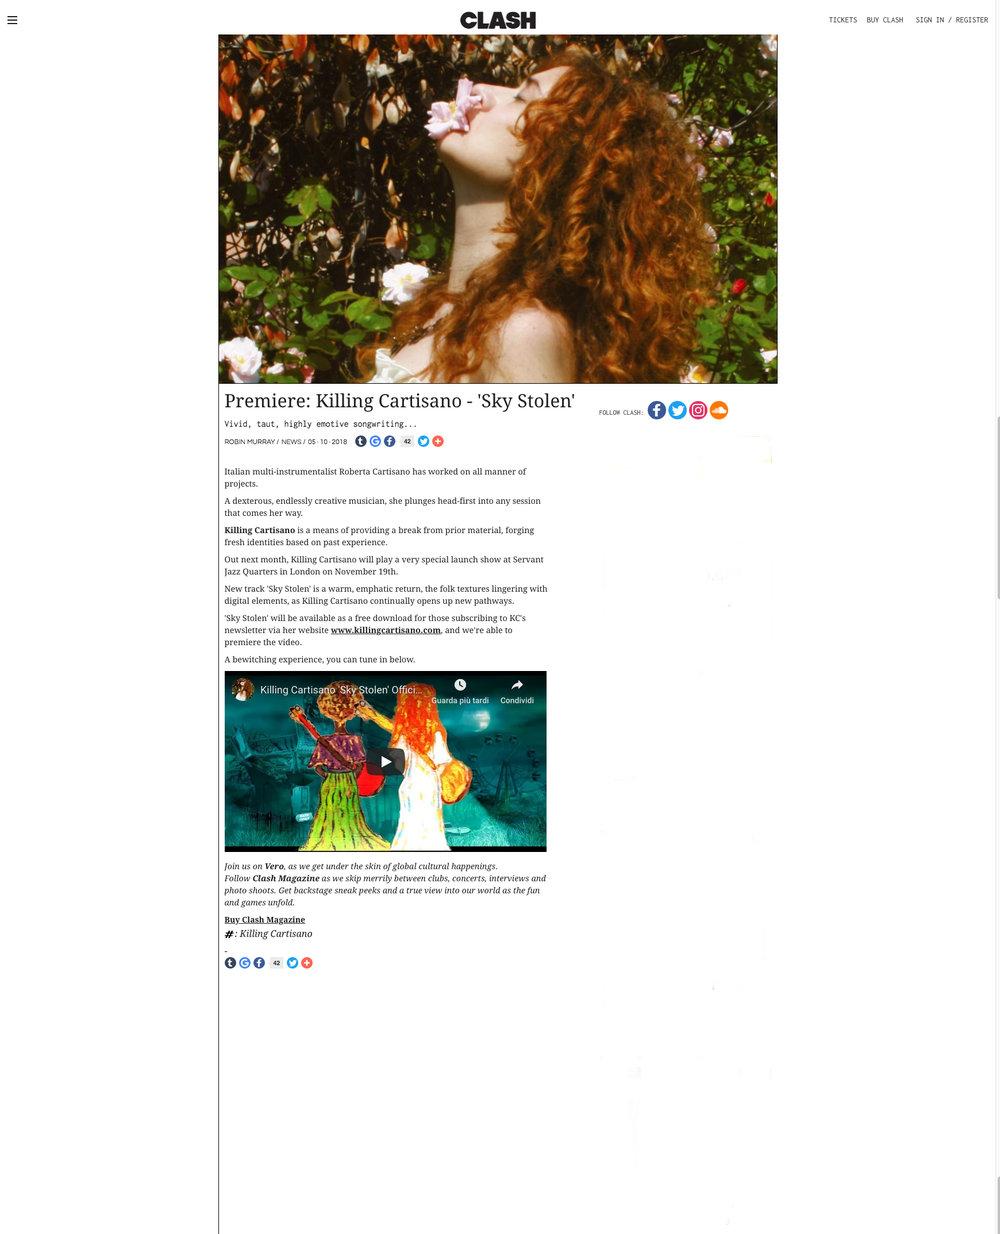 Premiere  Killing Cartisano - 'Sky Stolen'   News   Clash Magazine copy.jpg